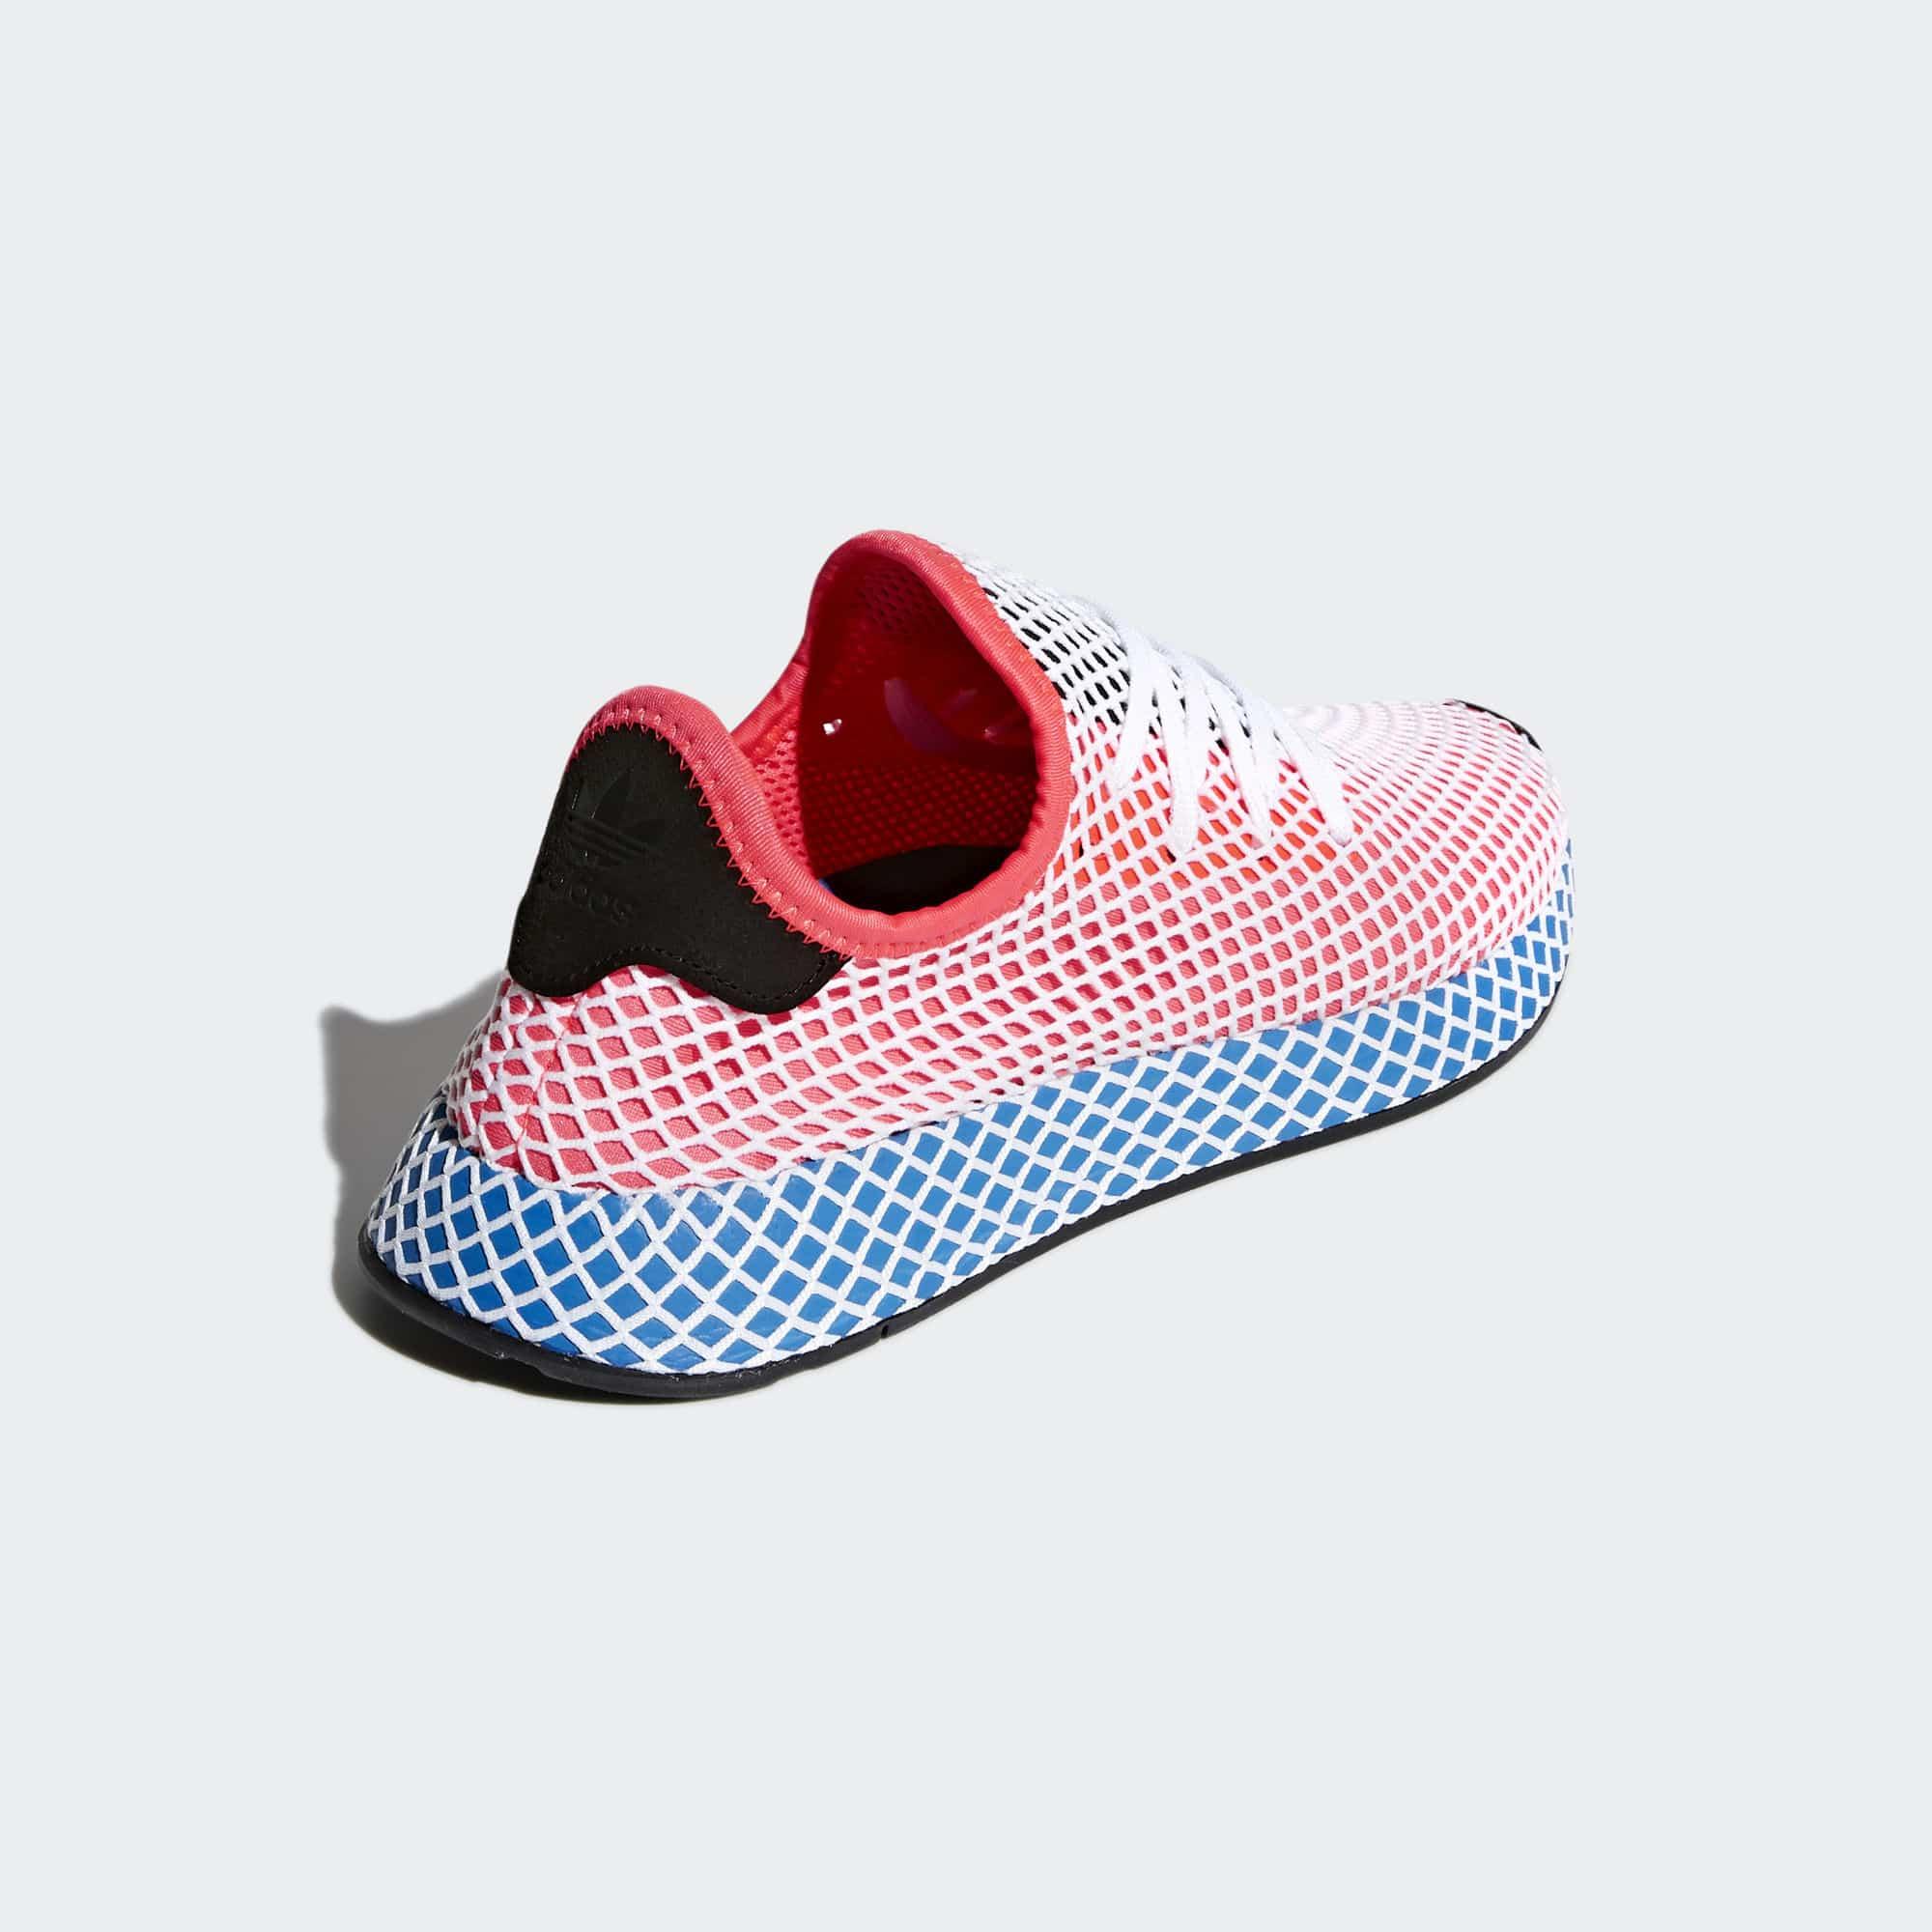 Deerupt Chaussures Parley Coureur Adidas uDCKMfZD